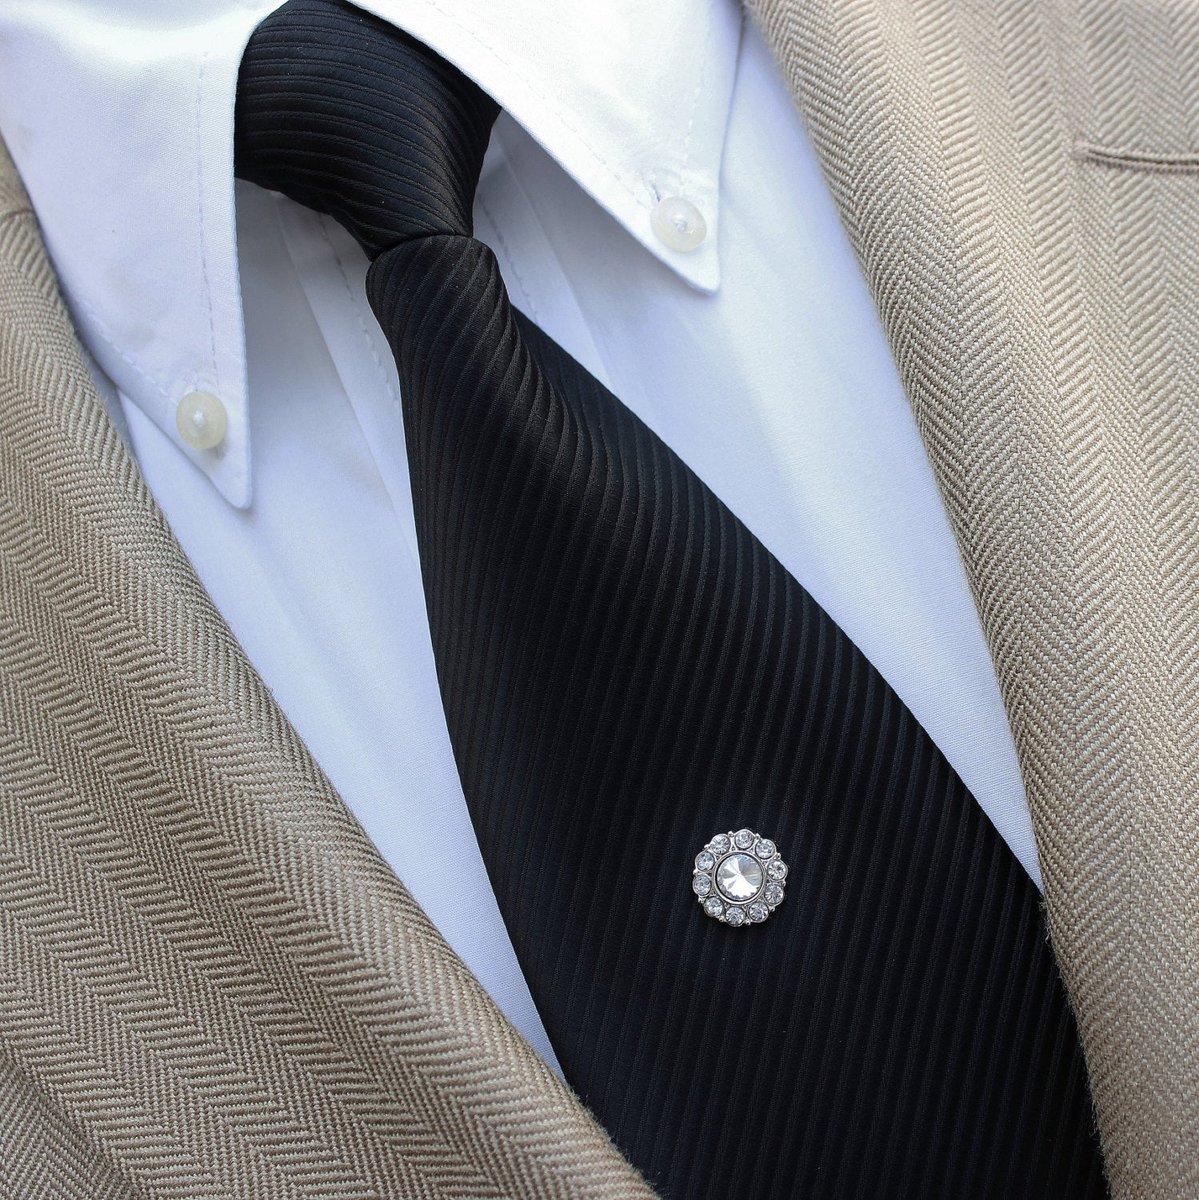 Mens Tie Tacks, Wedding Tie Clip, Rhinestone Silver Tie Tack for the Groom, Mens Tie Tack, Groomsman Gift, Groomsmen Gift, Grooms Tie Tack  #etsyshop #shopsmall #smallbiz #etsy #style #gifts #shopping #ecommerce